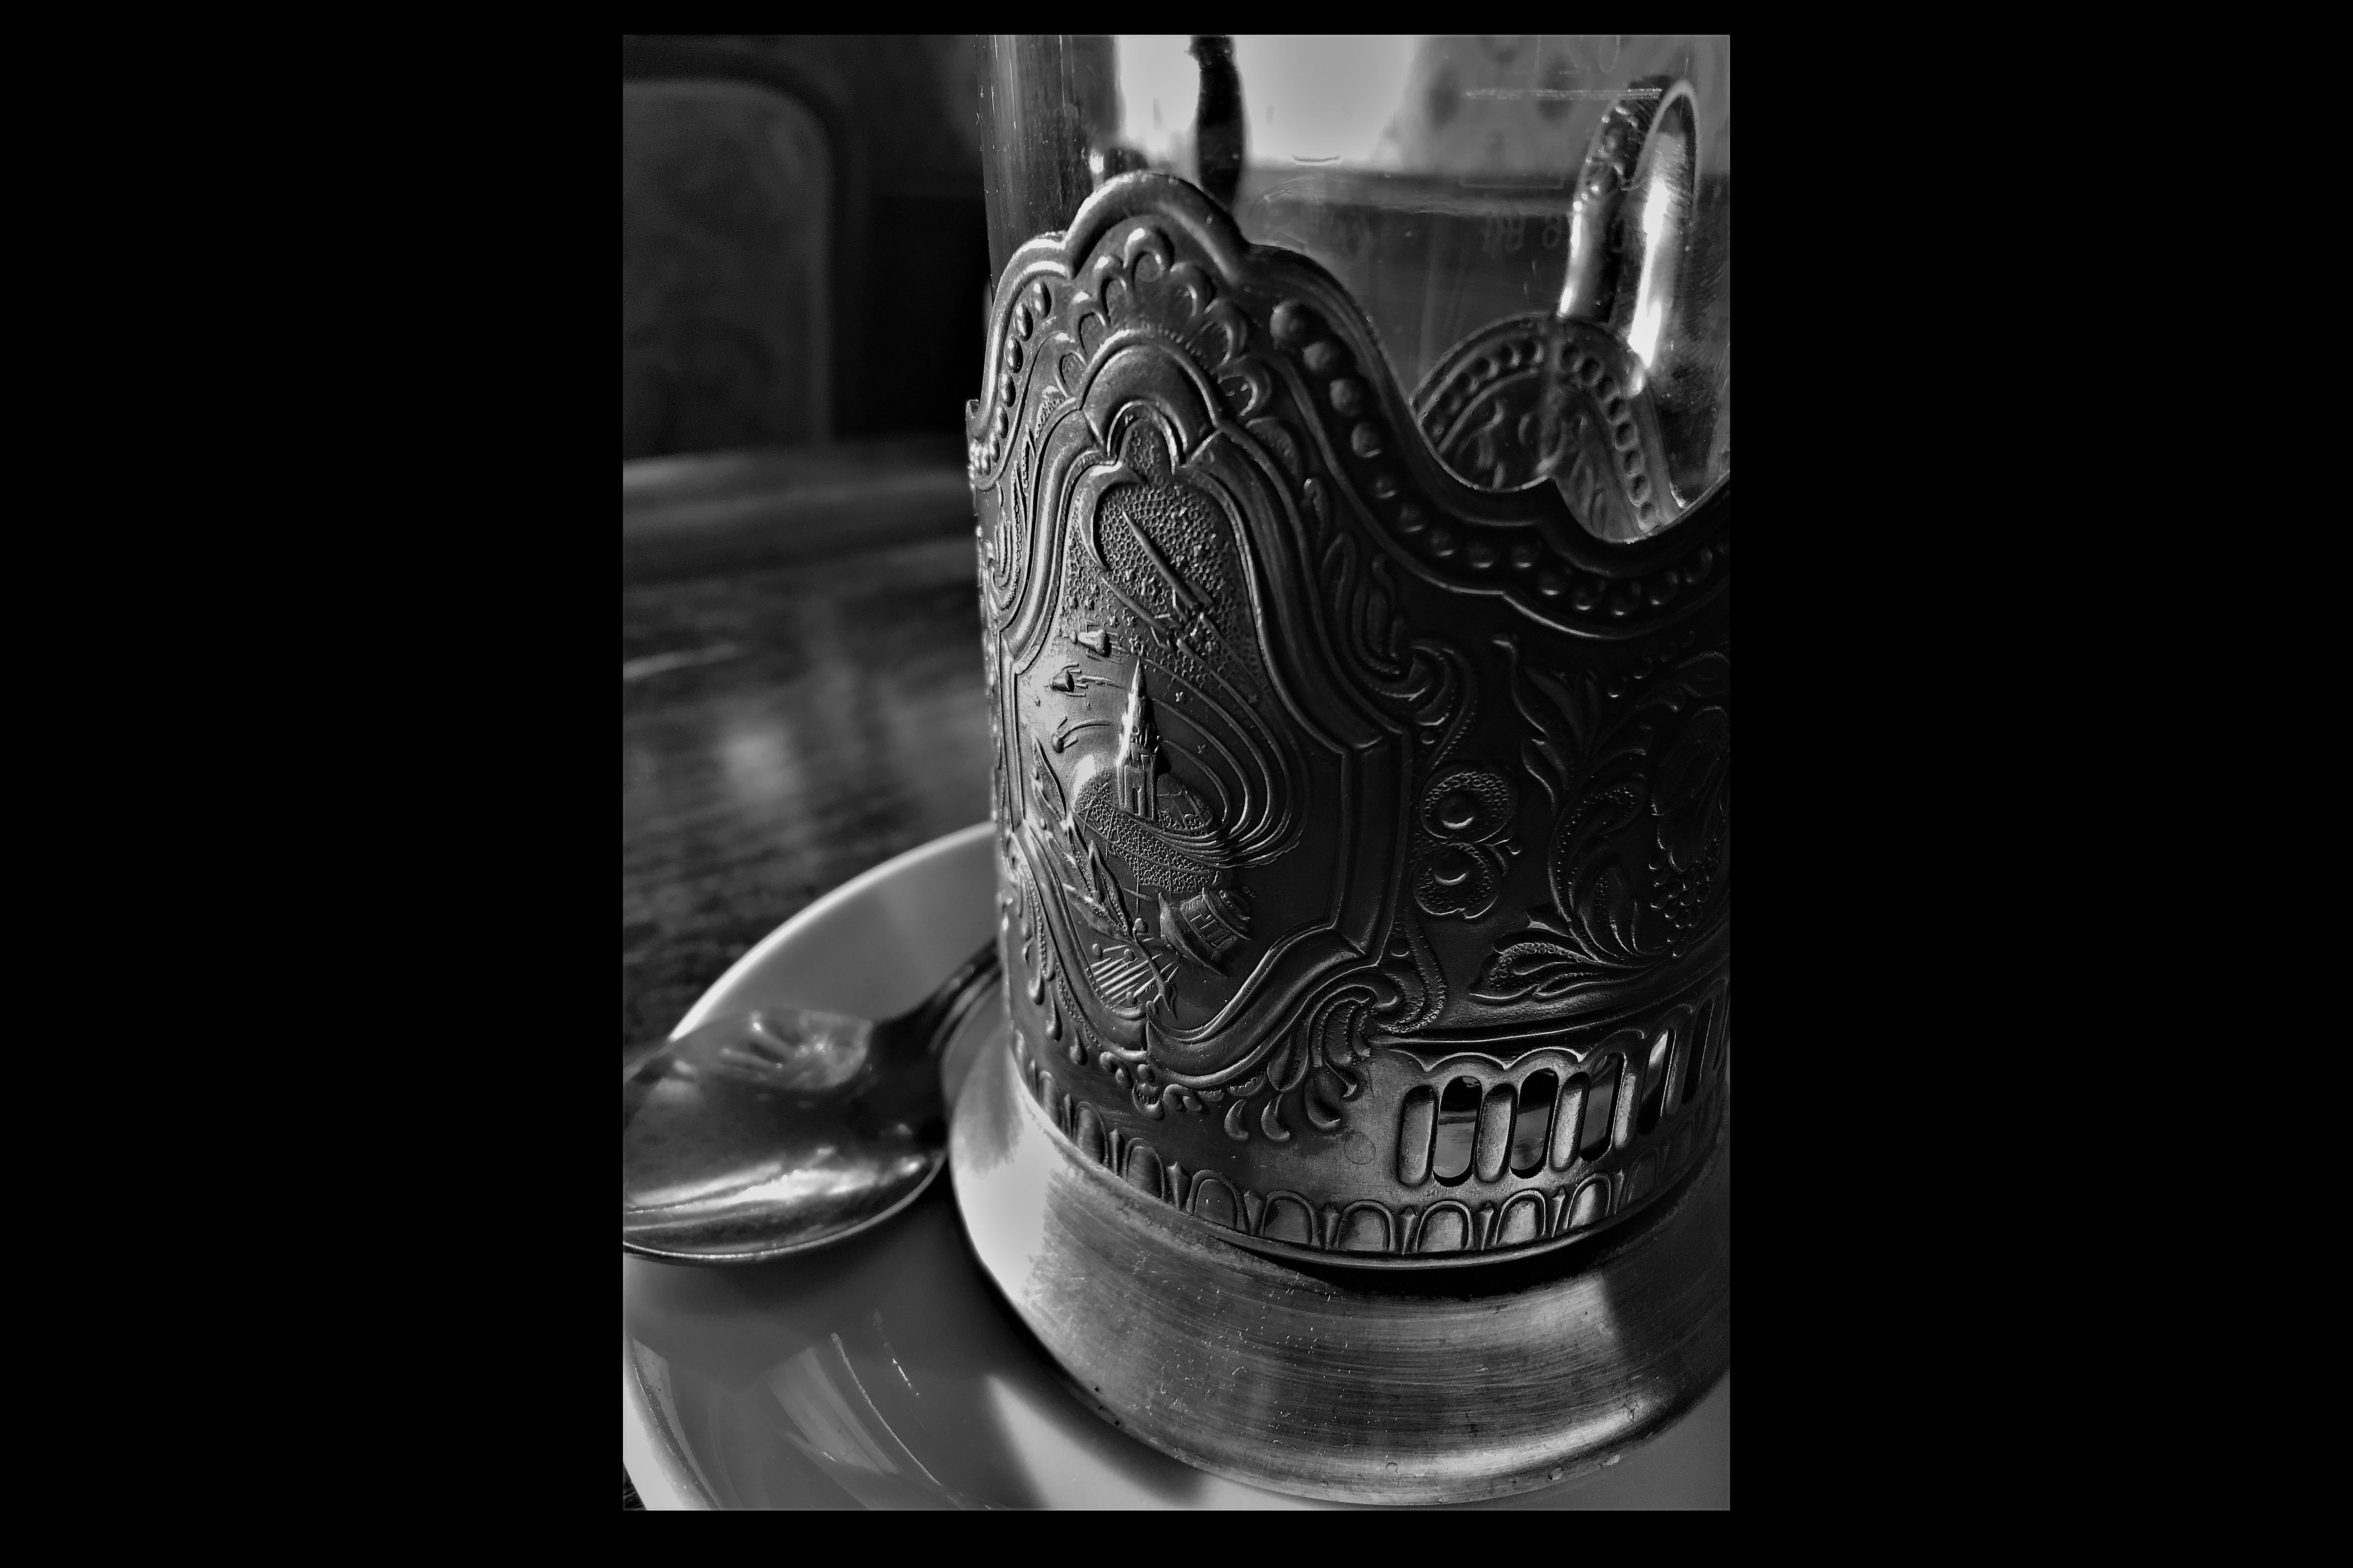 Tea glass detail at Masel Topf